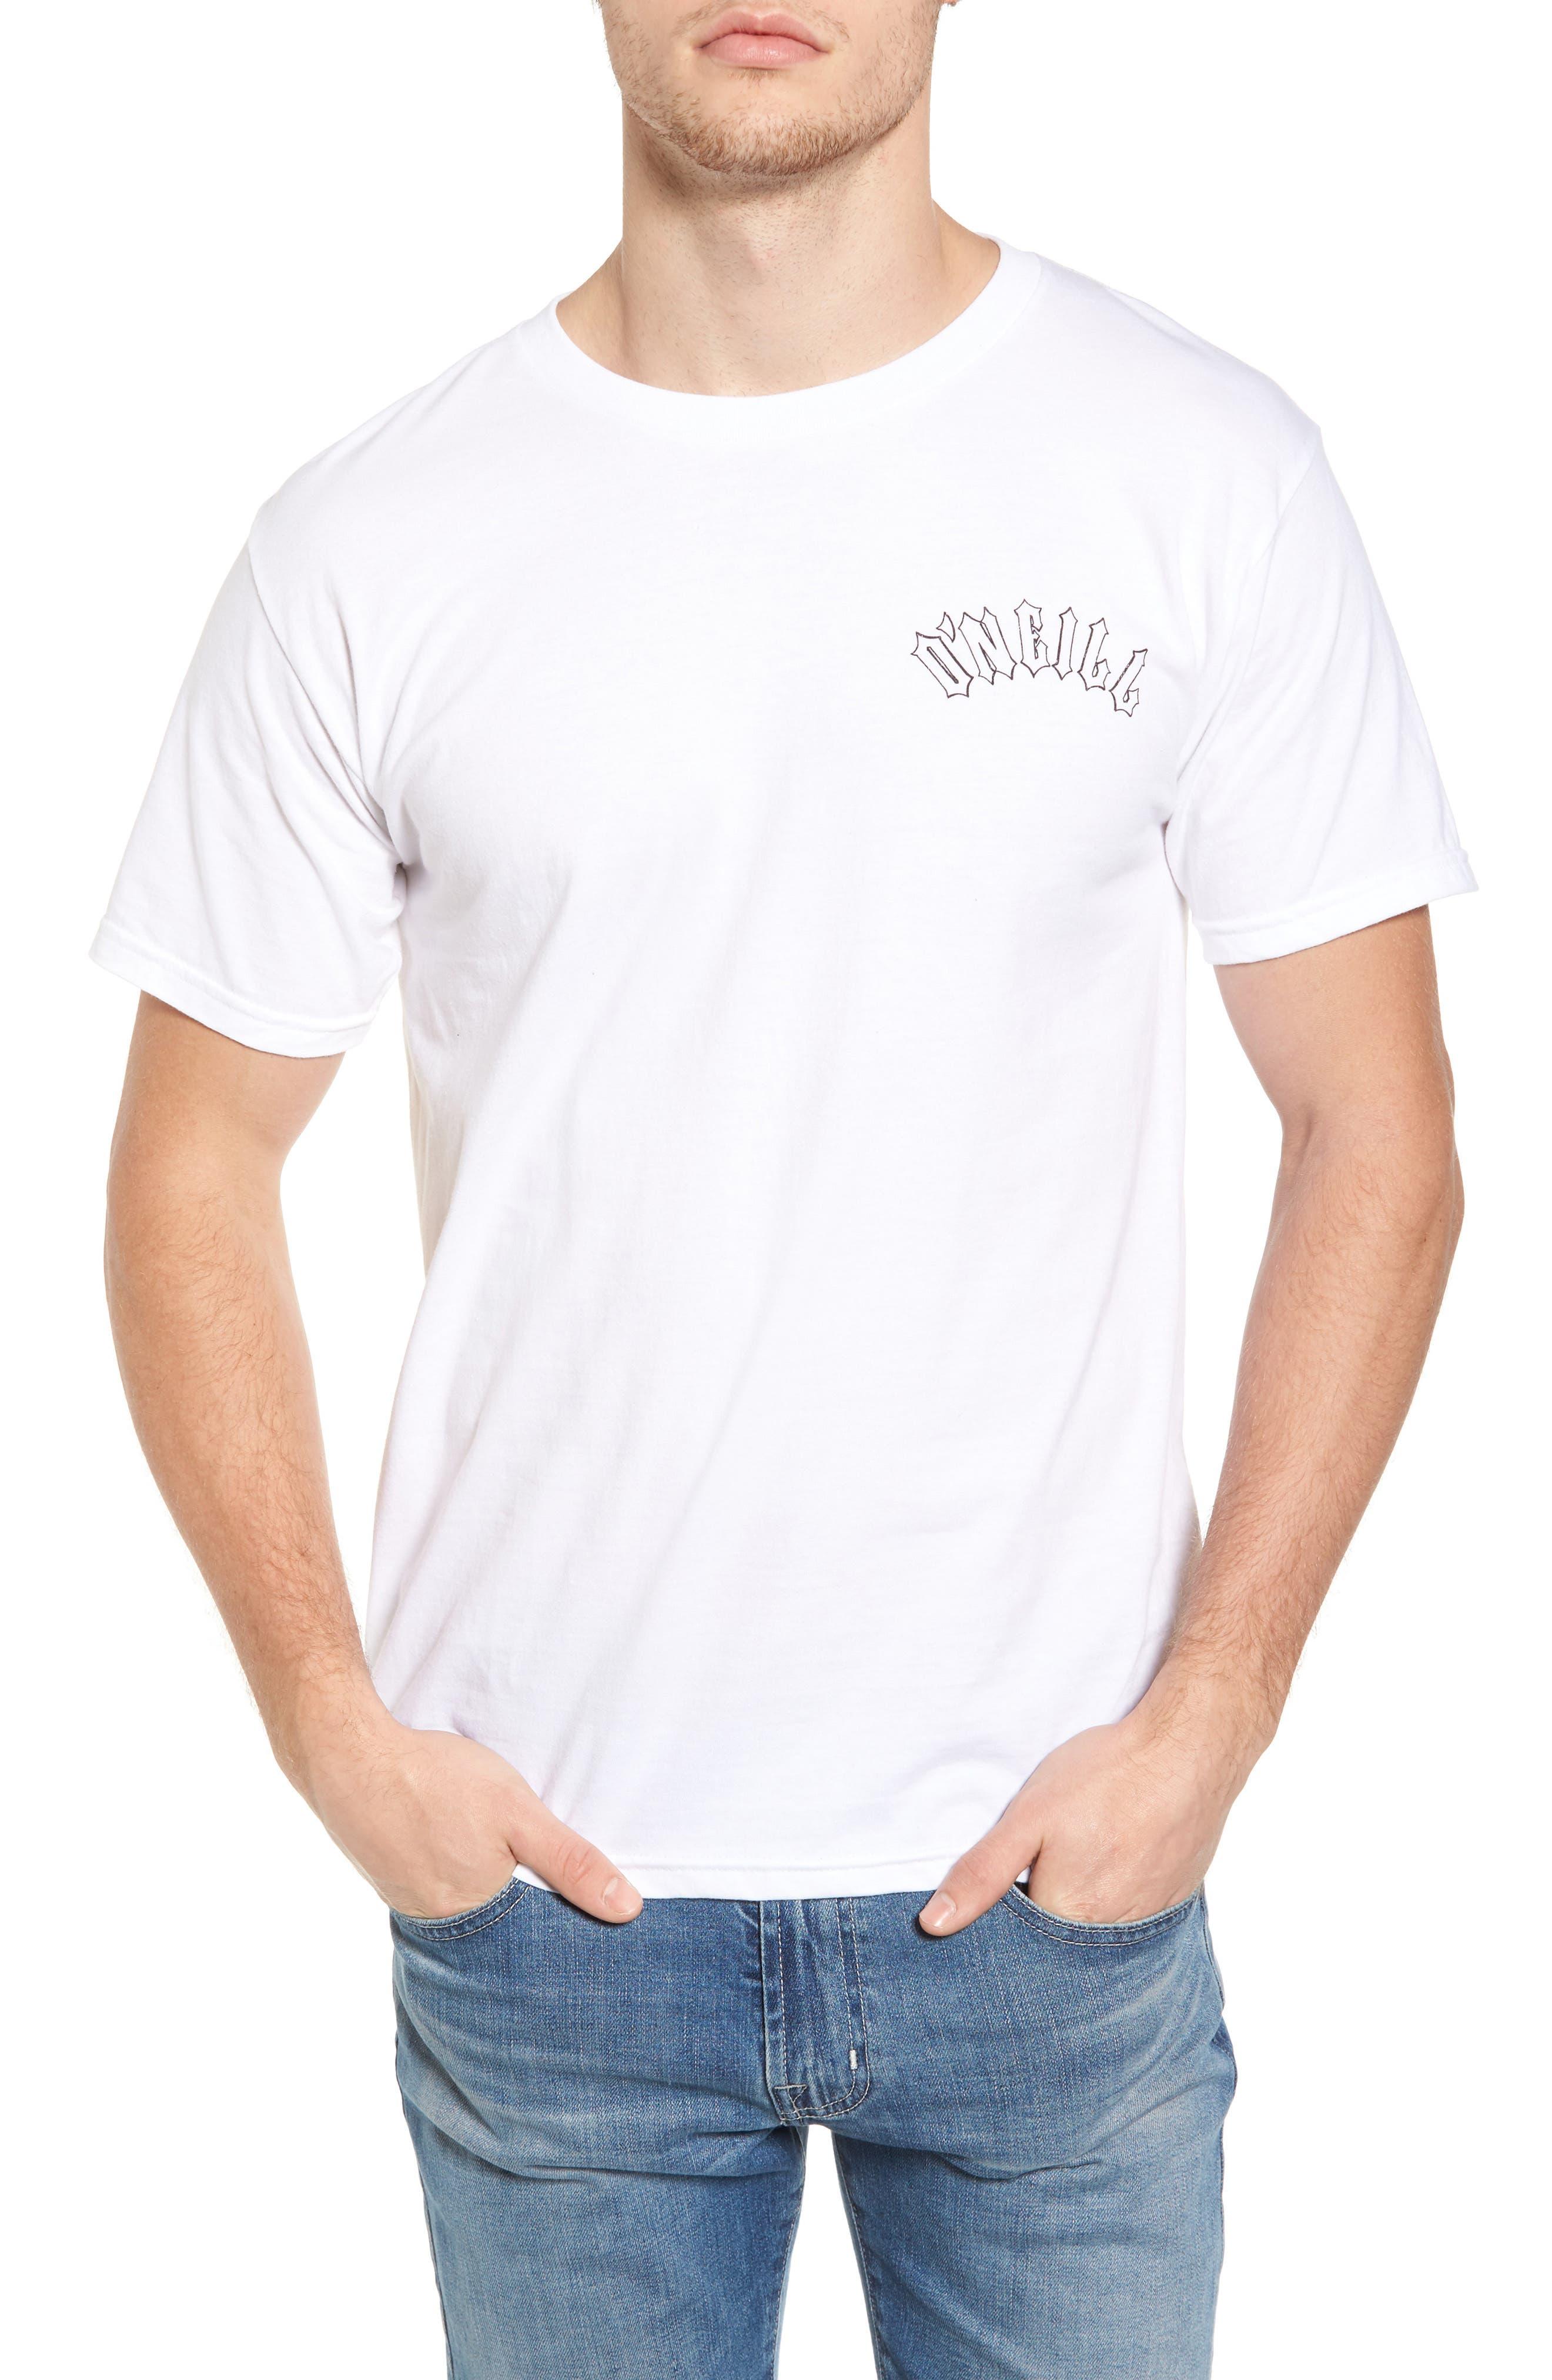 Main Image - O'Neill Titan Graphic T-Shirt